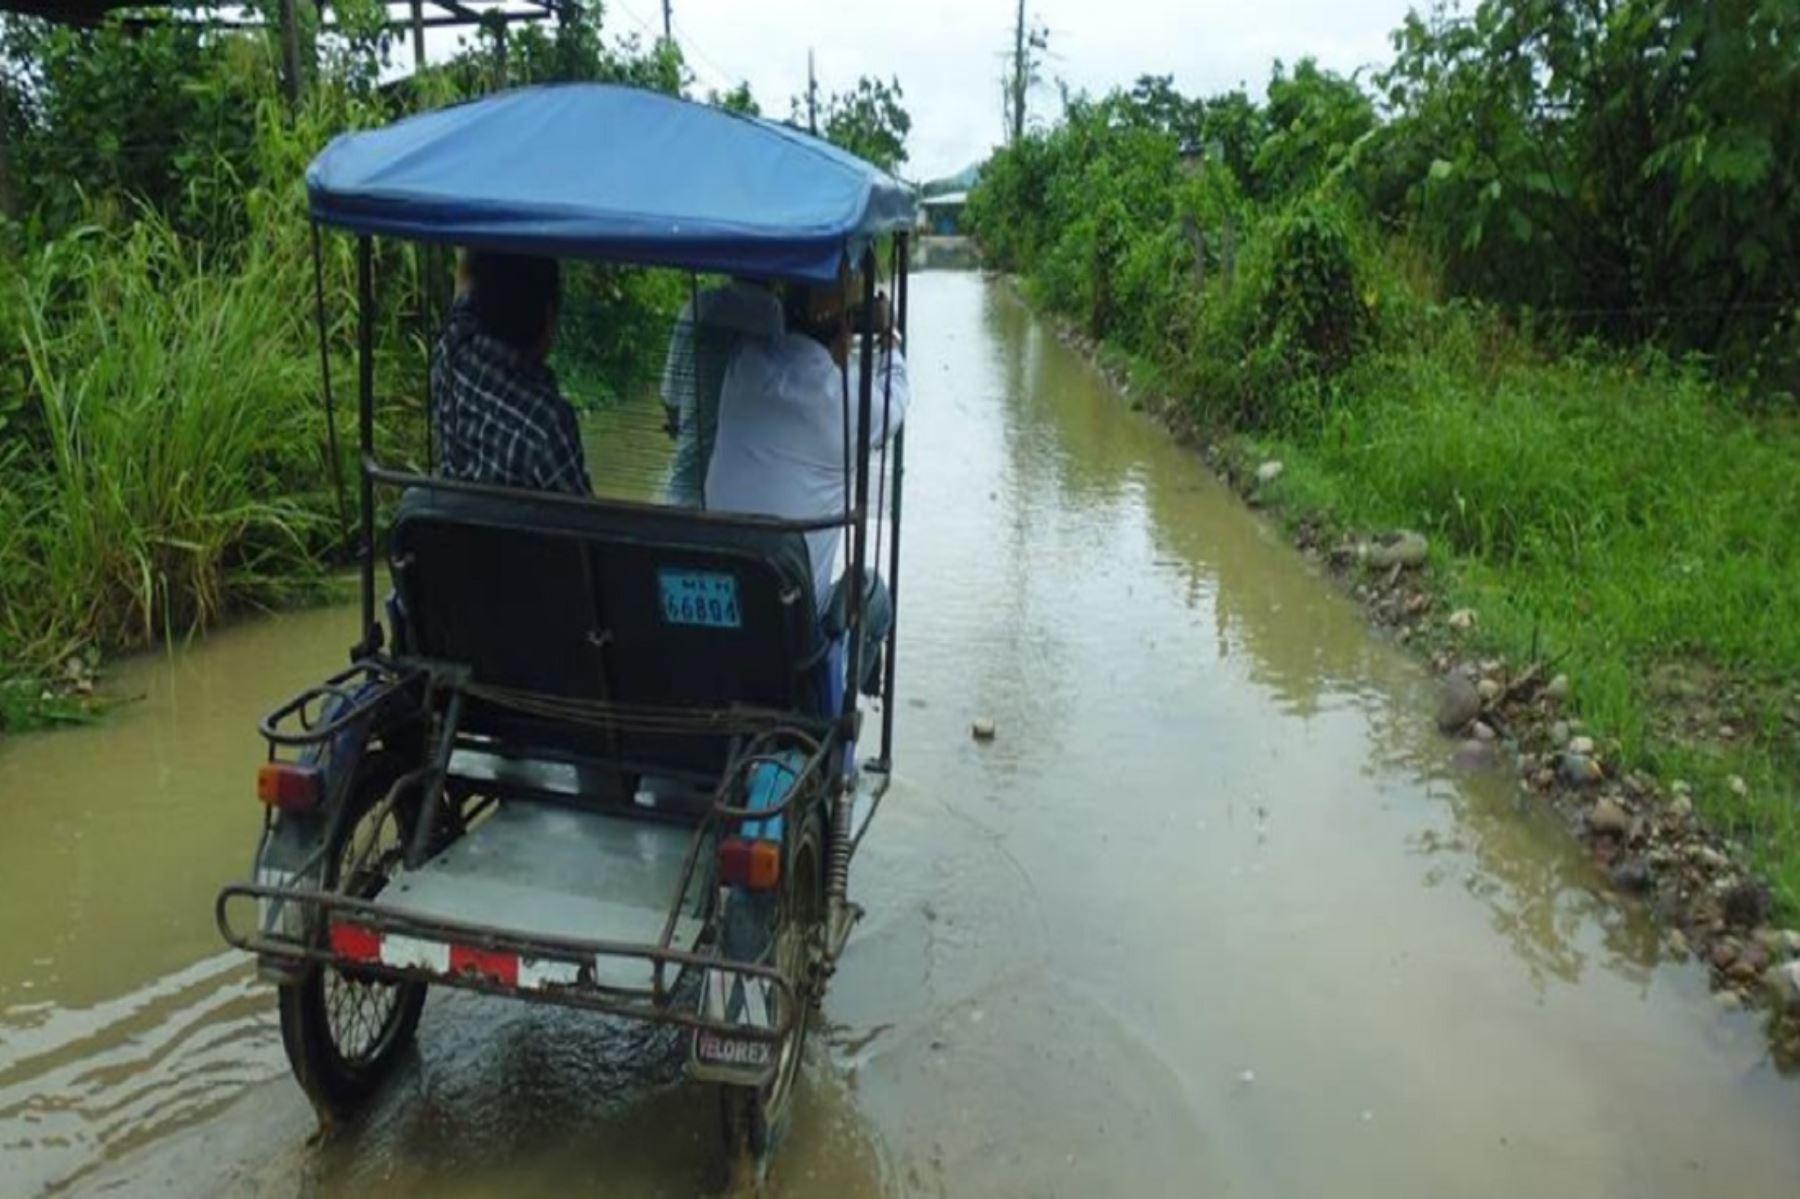 Lluvias constantes en San Martín inunda urbanización en Juanjuí